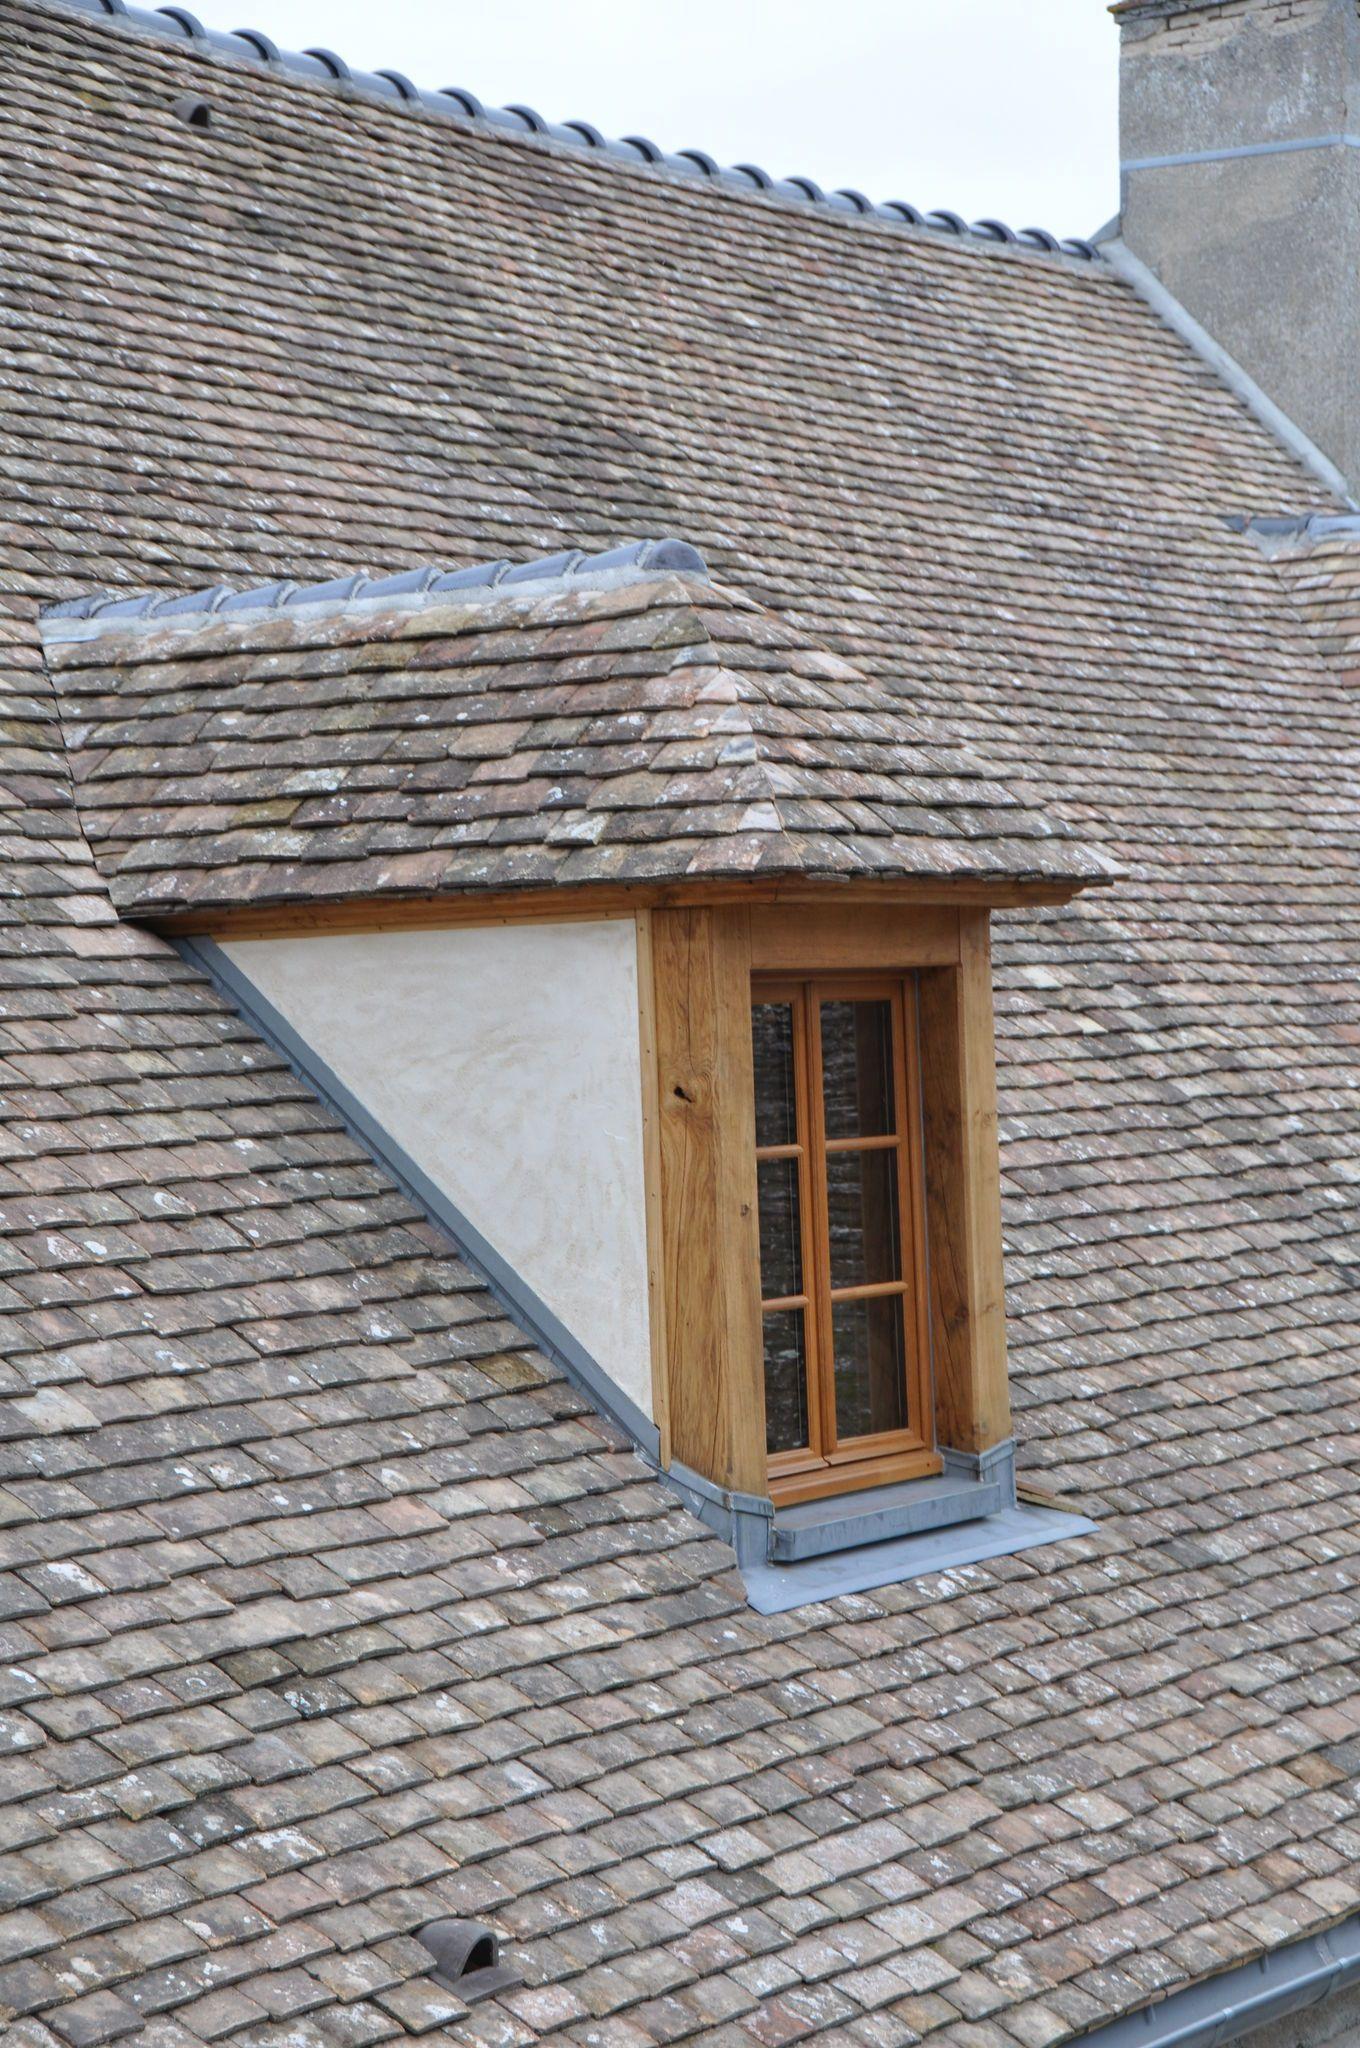 lucarne capucine en chêne | lucarnes | Lucarne de toit, Lucarne et ...